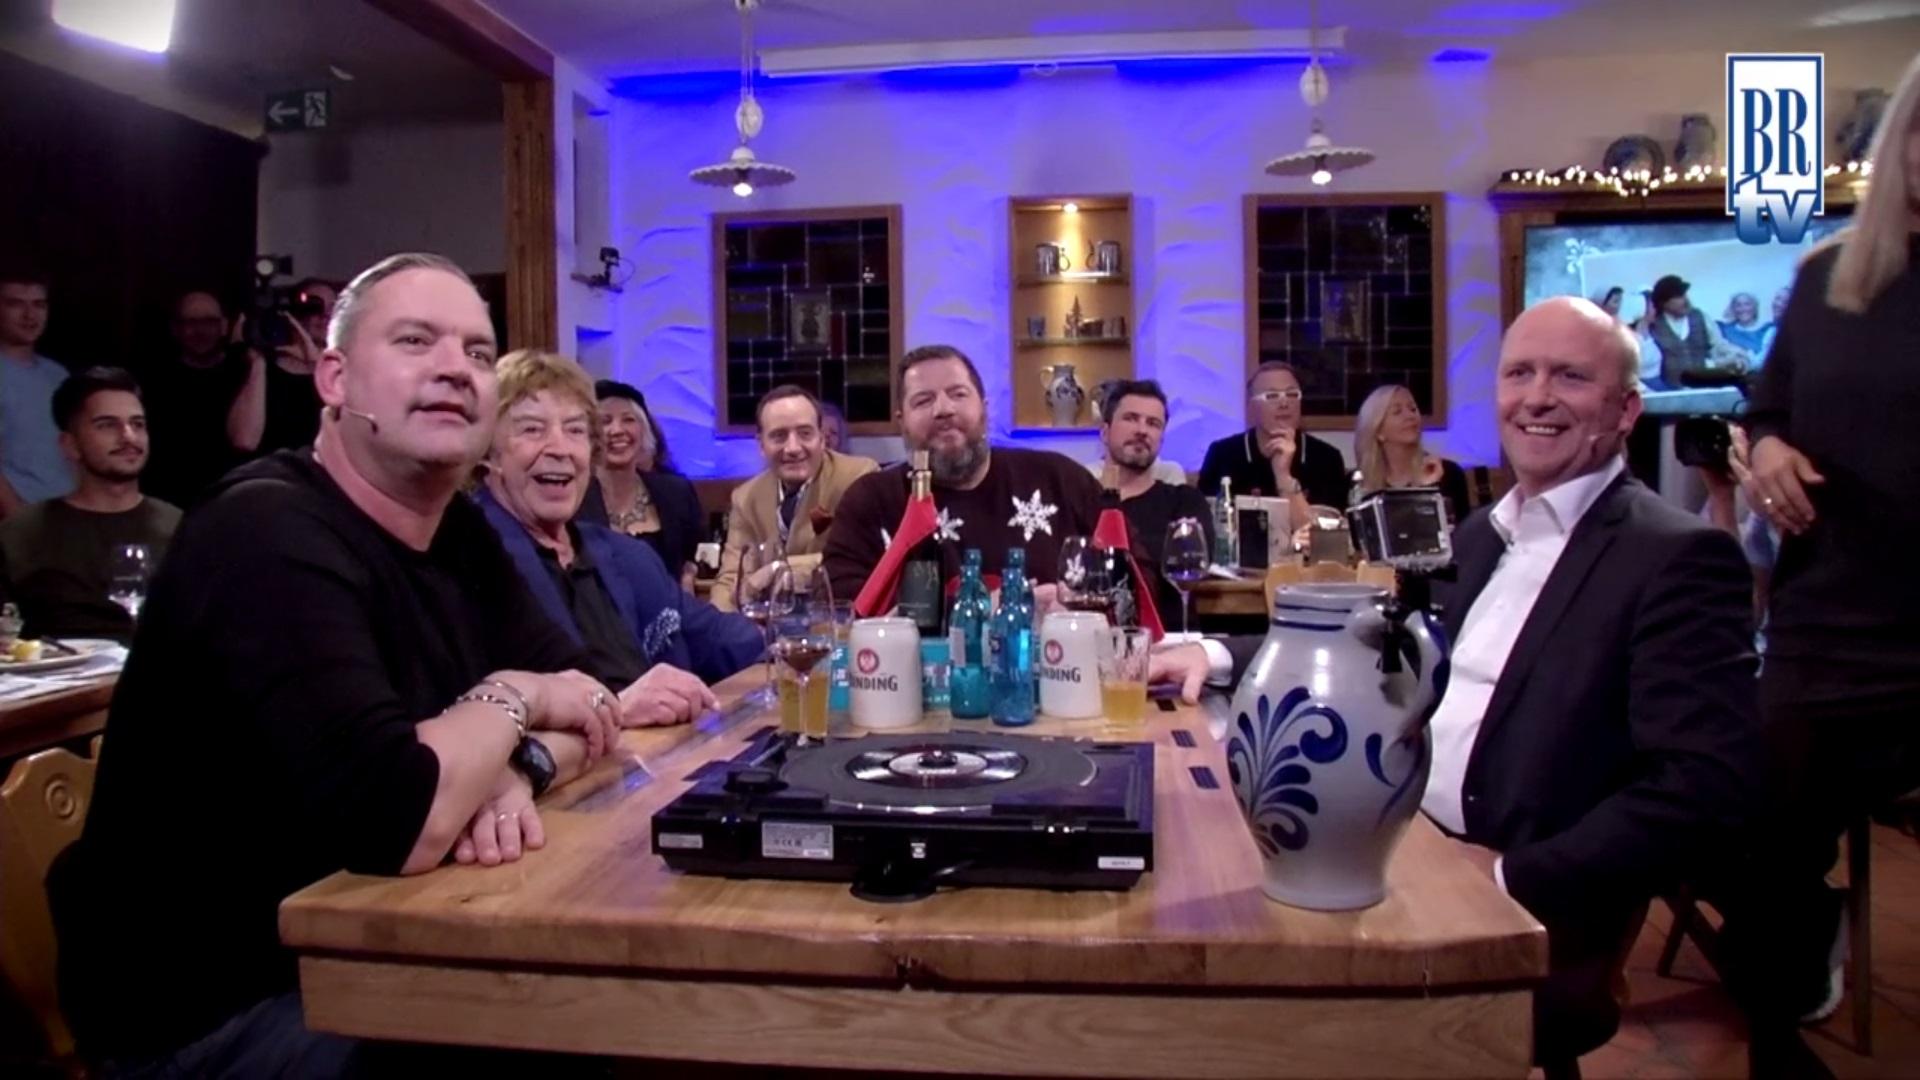 Bembel & Gebabbel – Folge 40 mit Tony Marshall, Christian Kahrmann & Uwe Beckerb